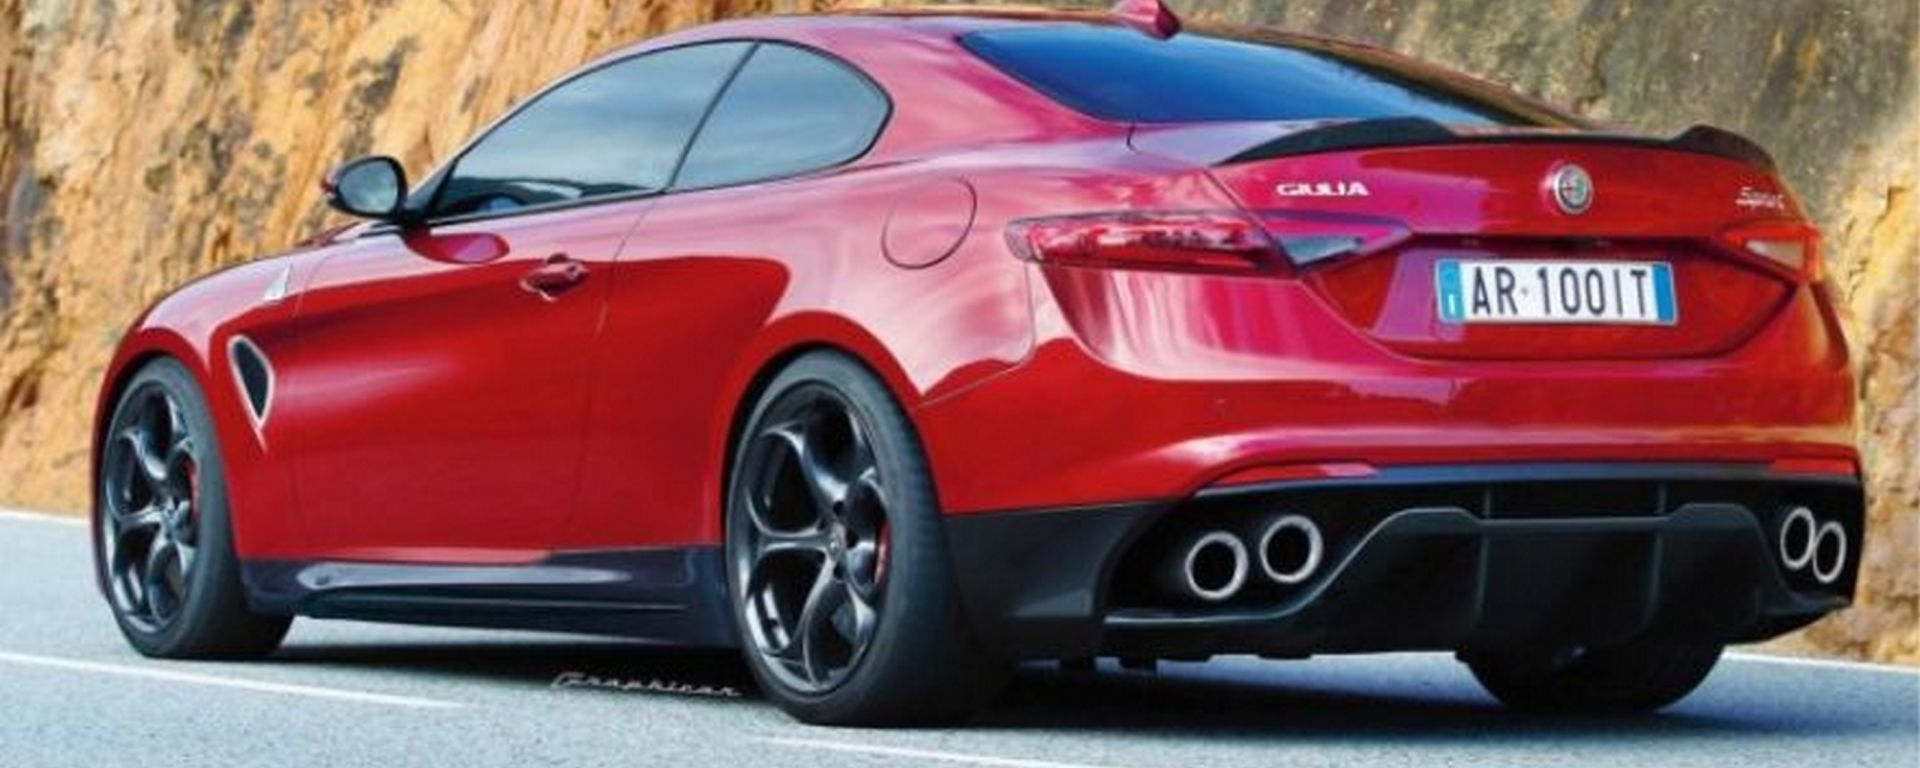 alfa romeo giulia coupe 2019 a motore ibrido da 641 cv  si far u00e0 o no